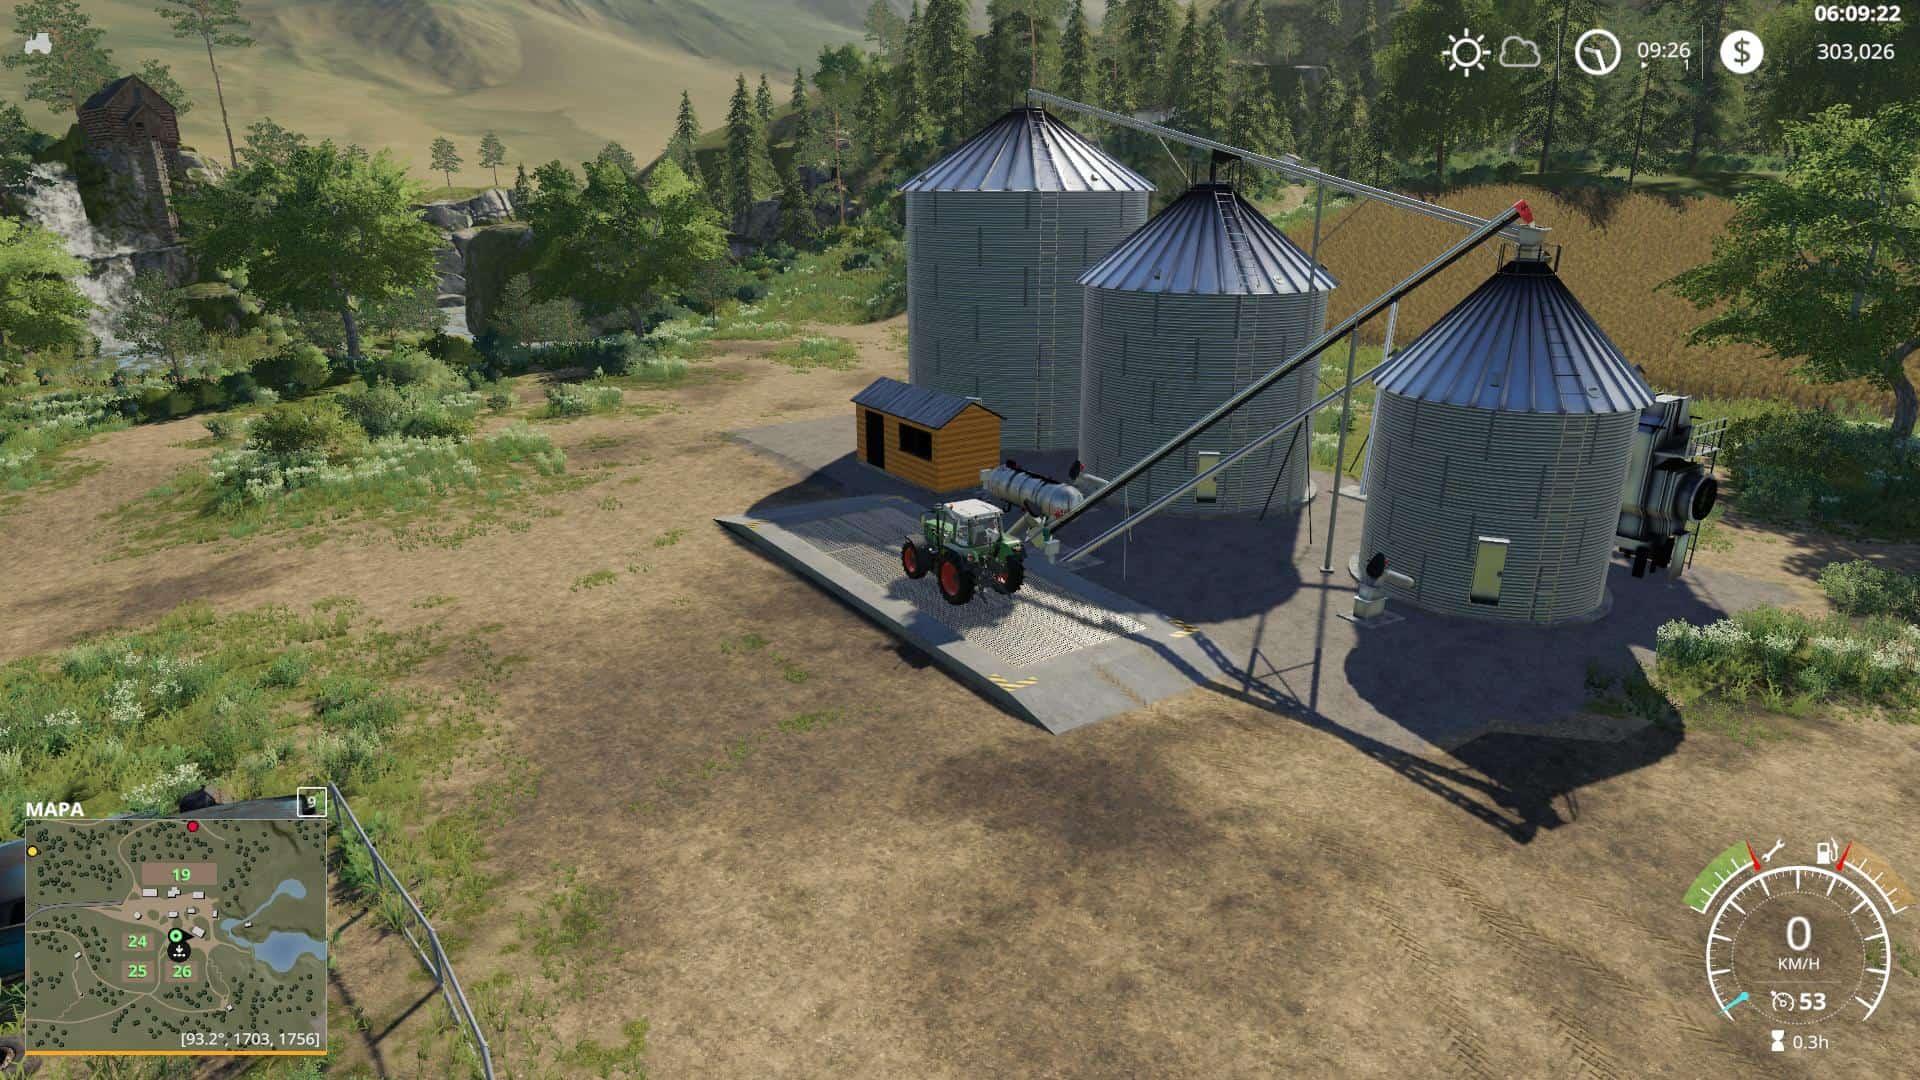 Large Grain Silo v1 0 1 0 Mod - Farming Simulator 19 Mod / FS19